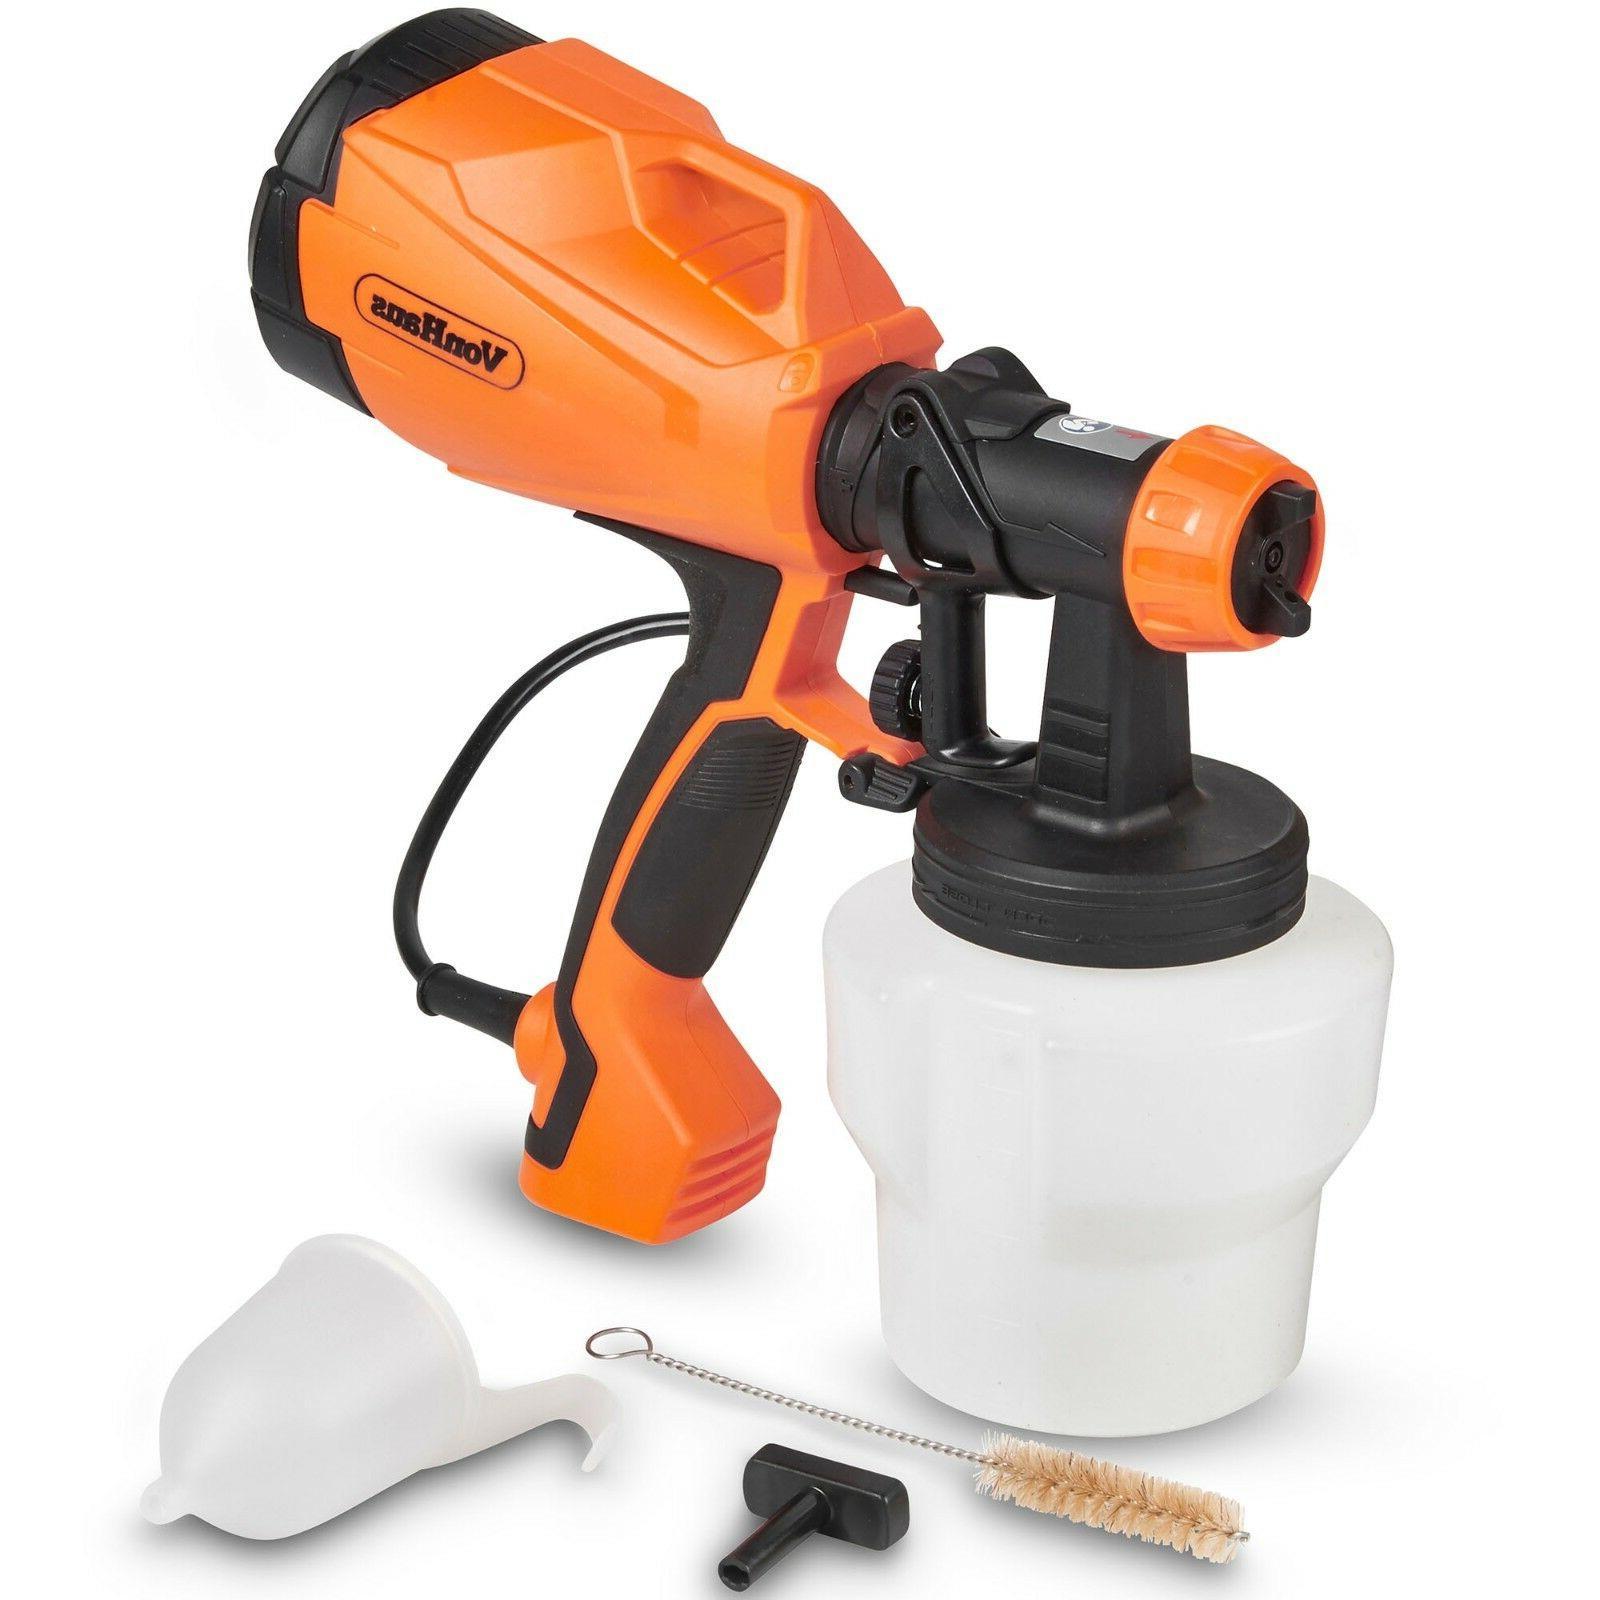 electric hvlp paint sprayer gun spray pattern